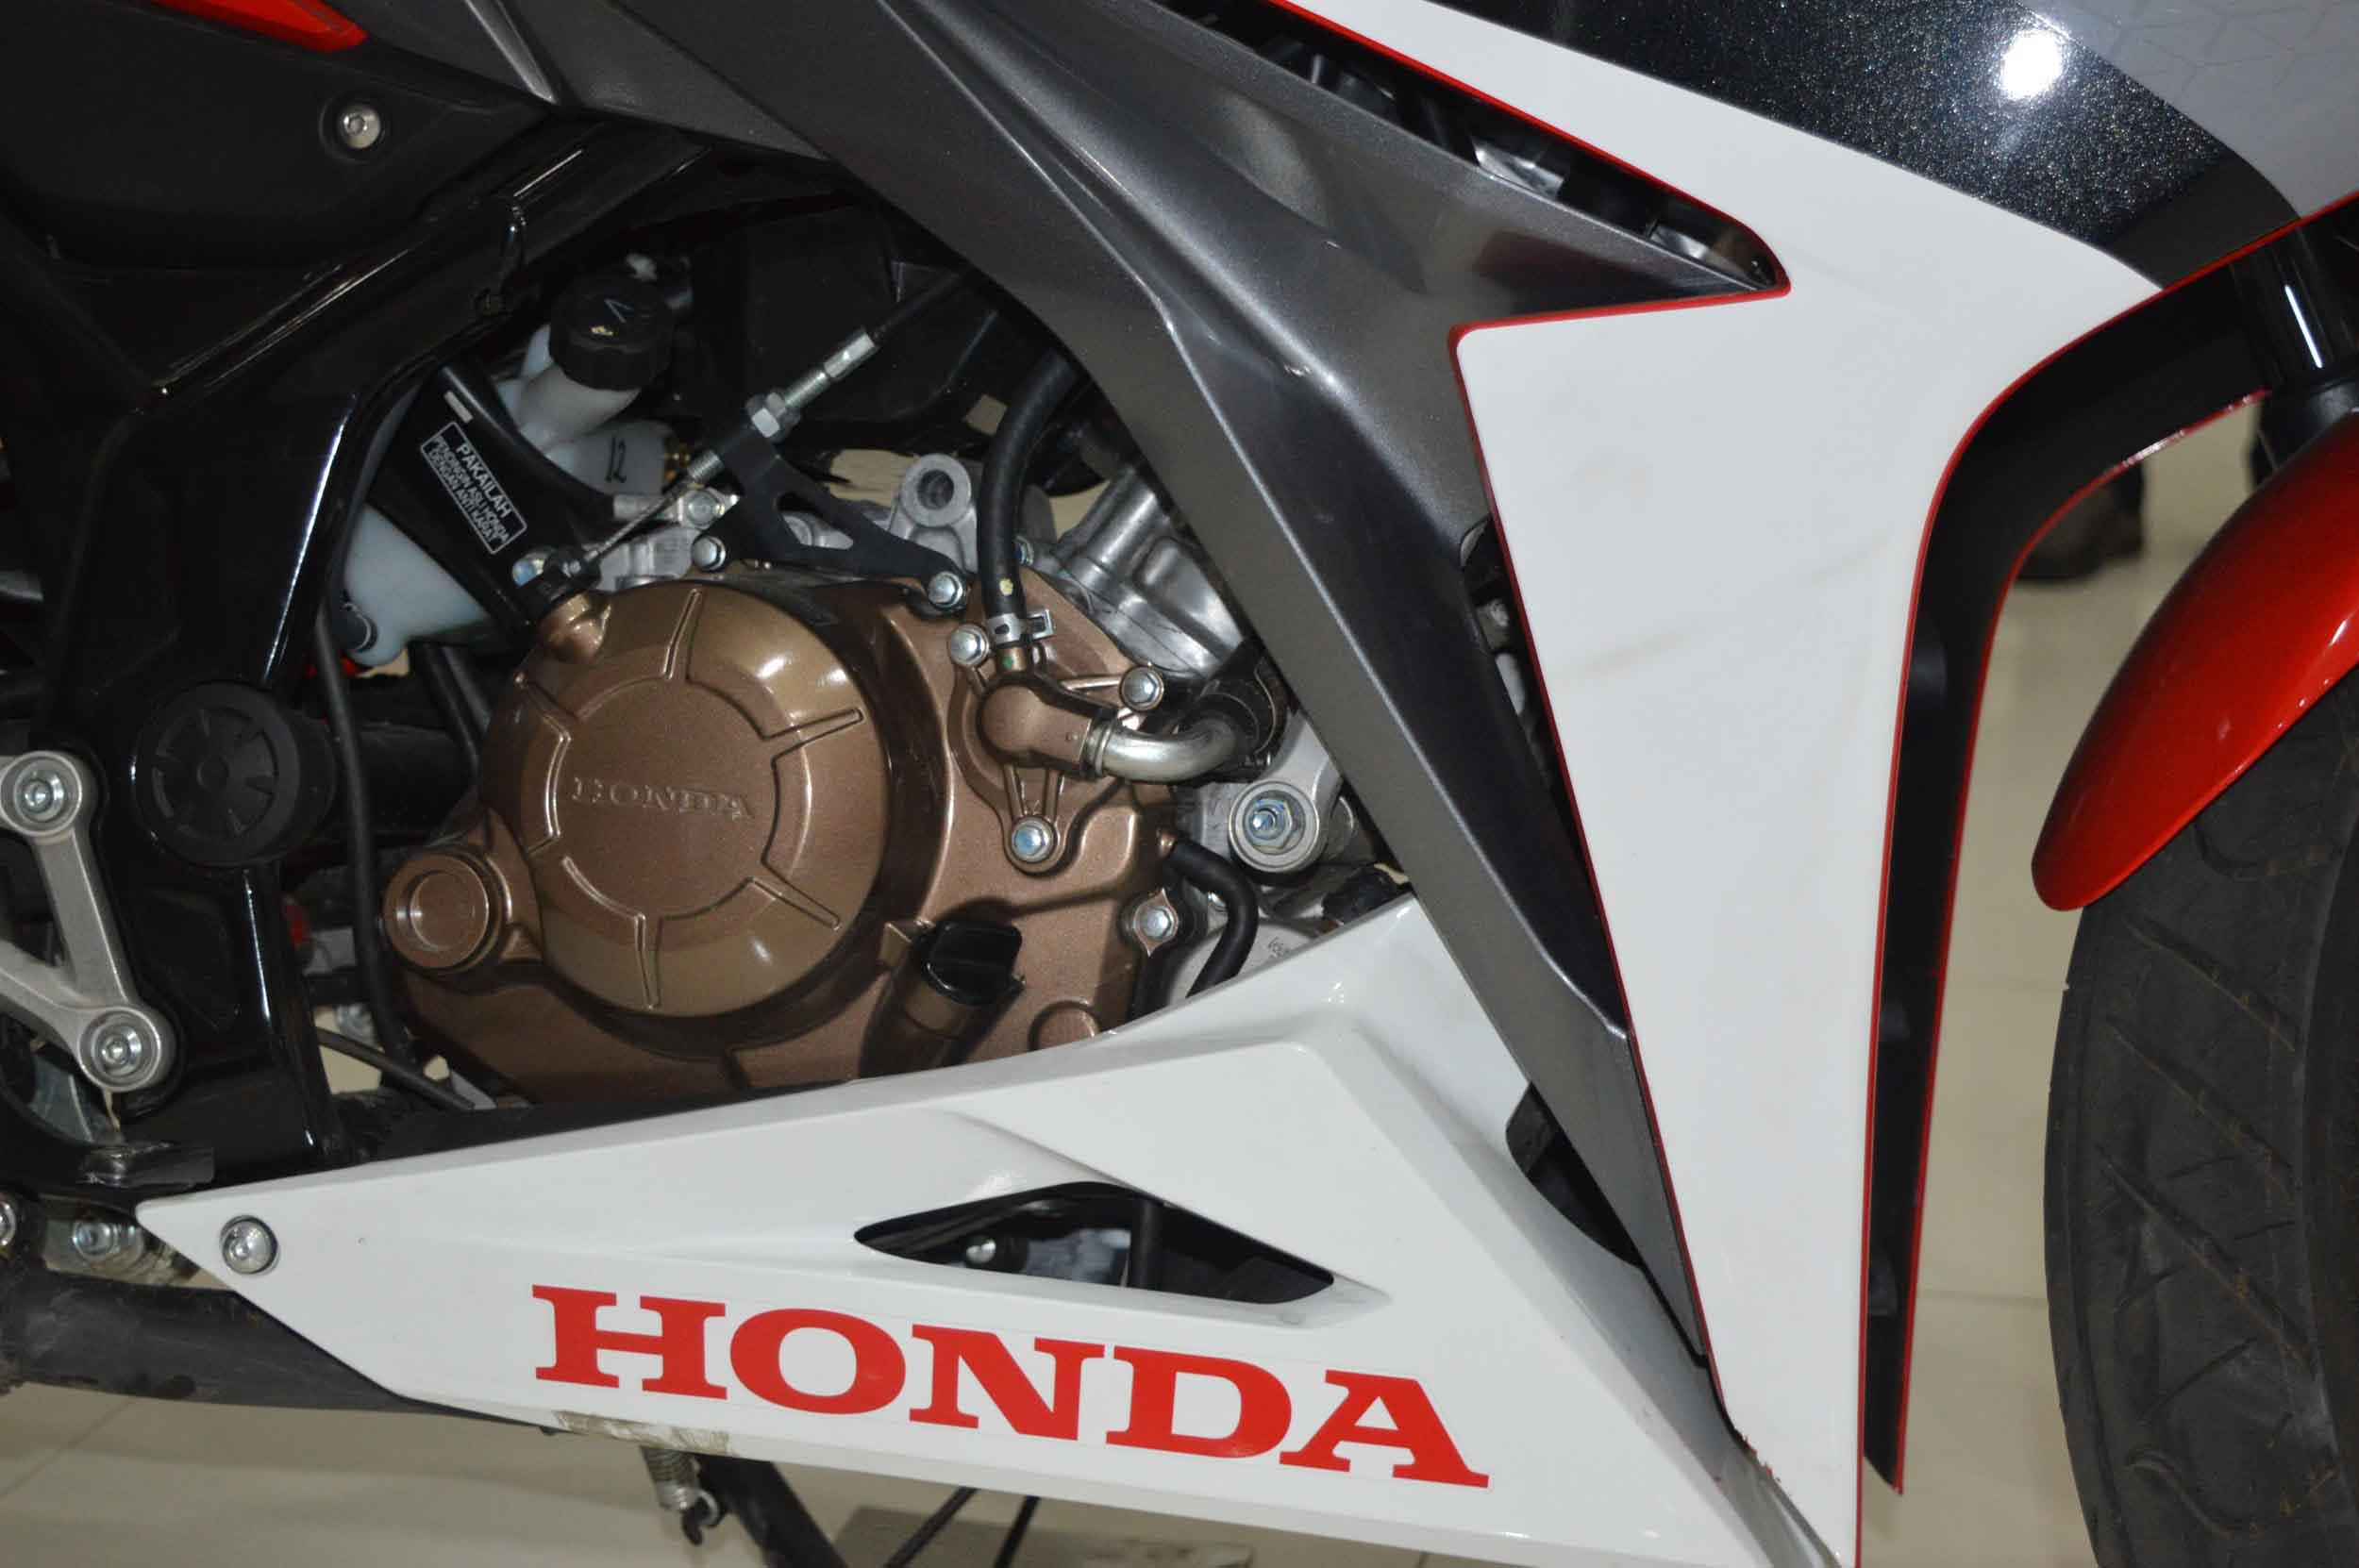 Honda Community Soft Launching Dan Test Ride All New Cbr 150 R 150r Racing Red Kota Semarang Seluruh Peserta Menjalani Di Sirkut Tawang Mas Prpp Cuaca Yang Sangat Mendukung Panas Bangete Cah Tetapi